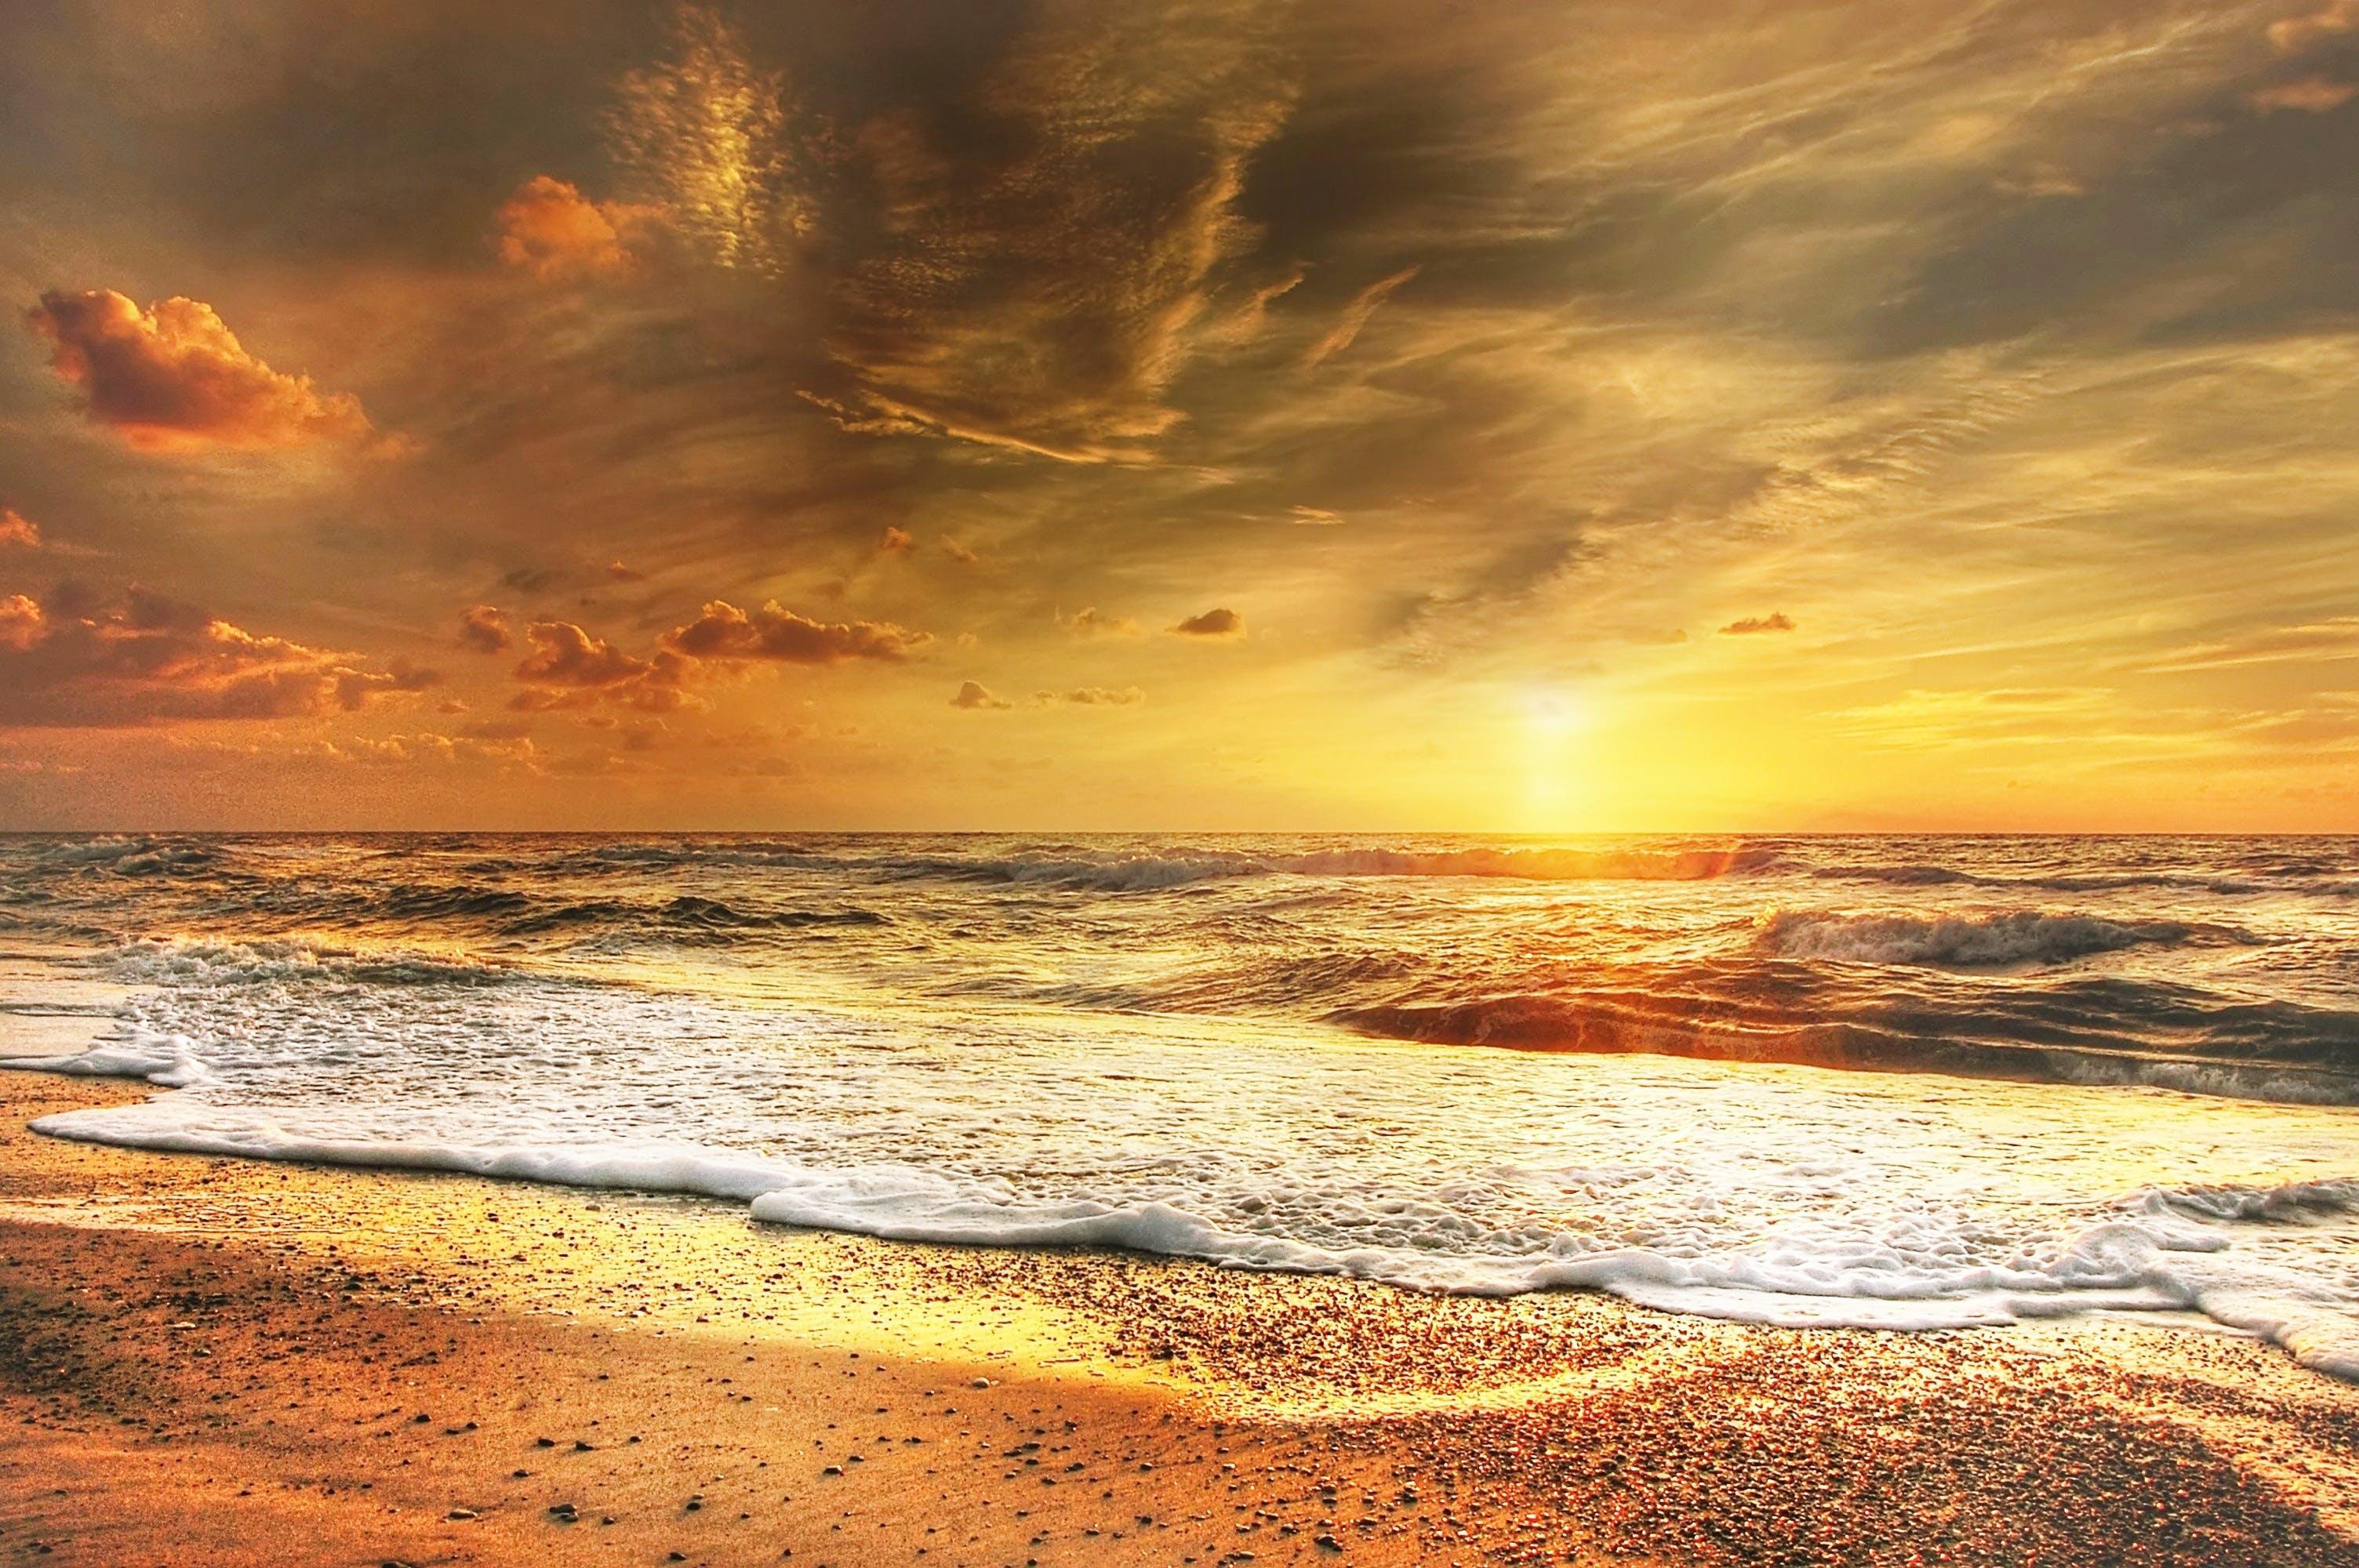 Photography of Crashing Sea Waves on Shore